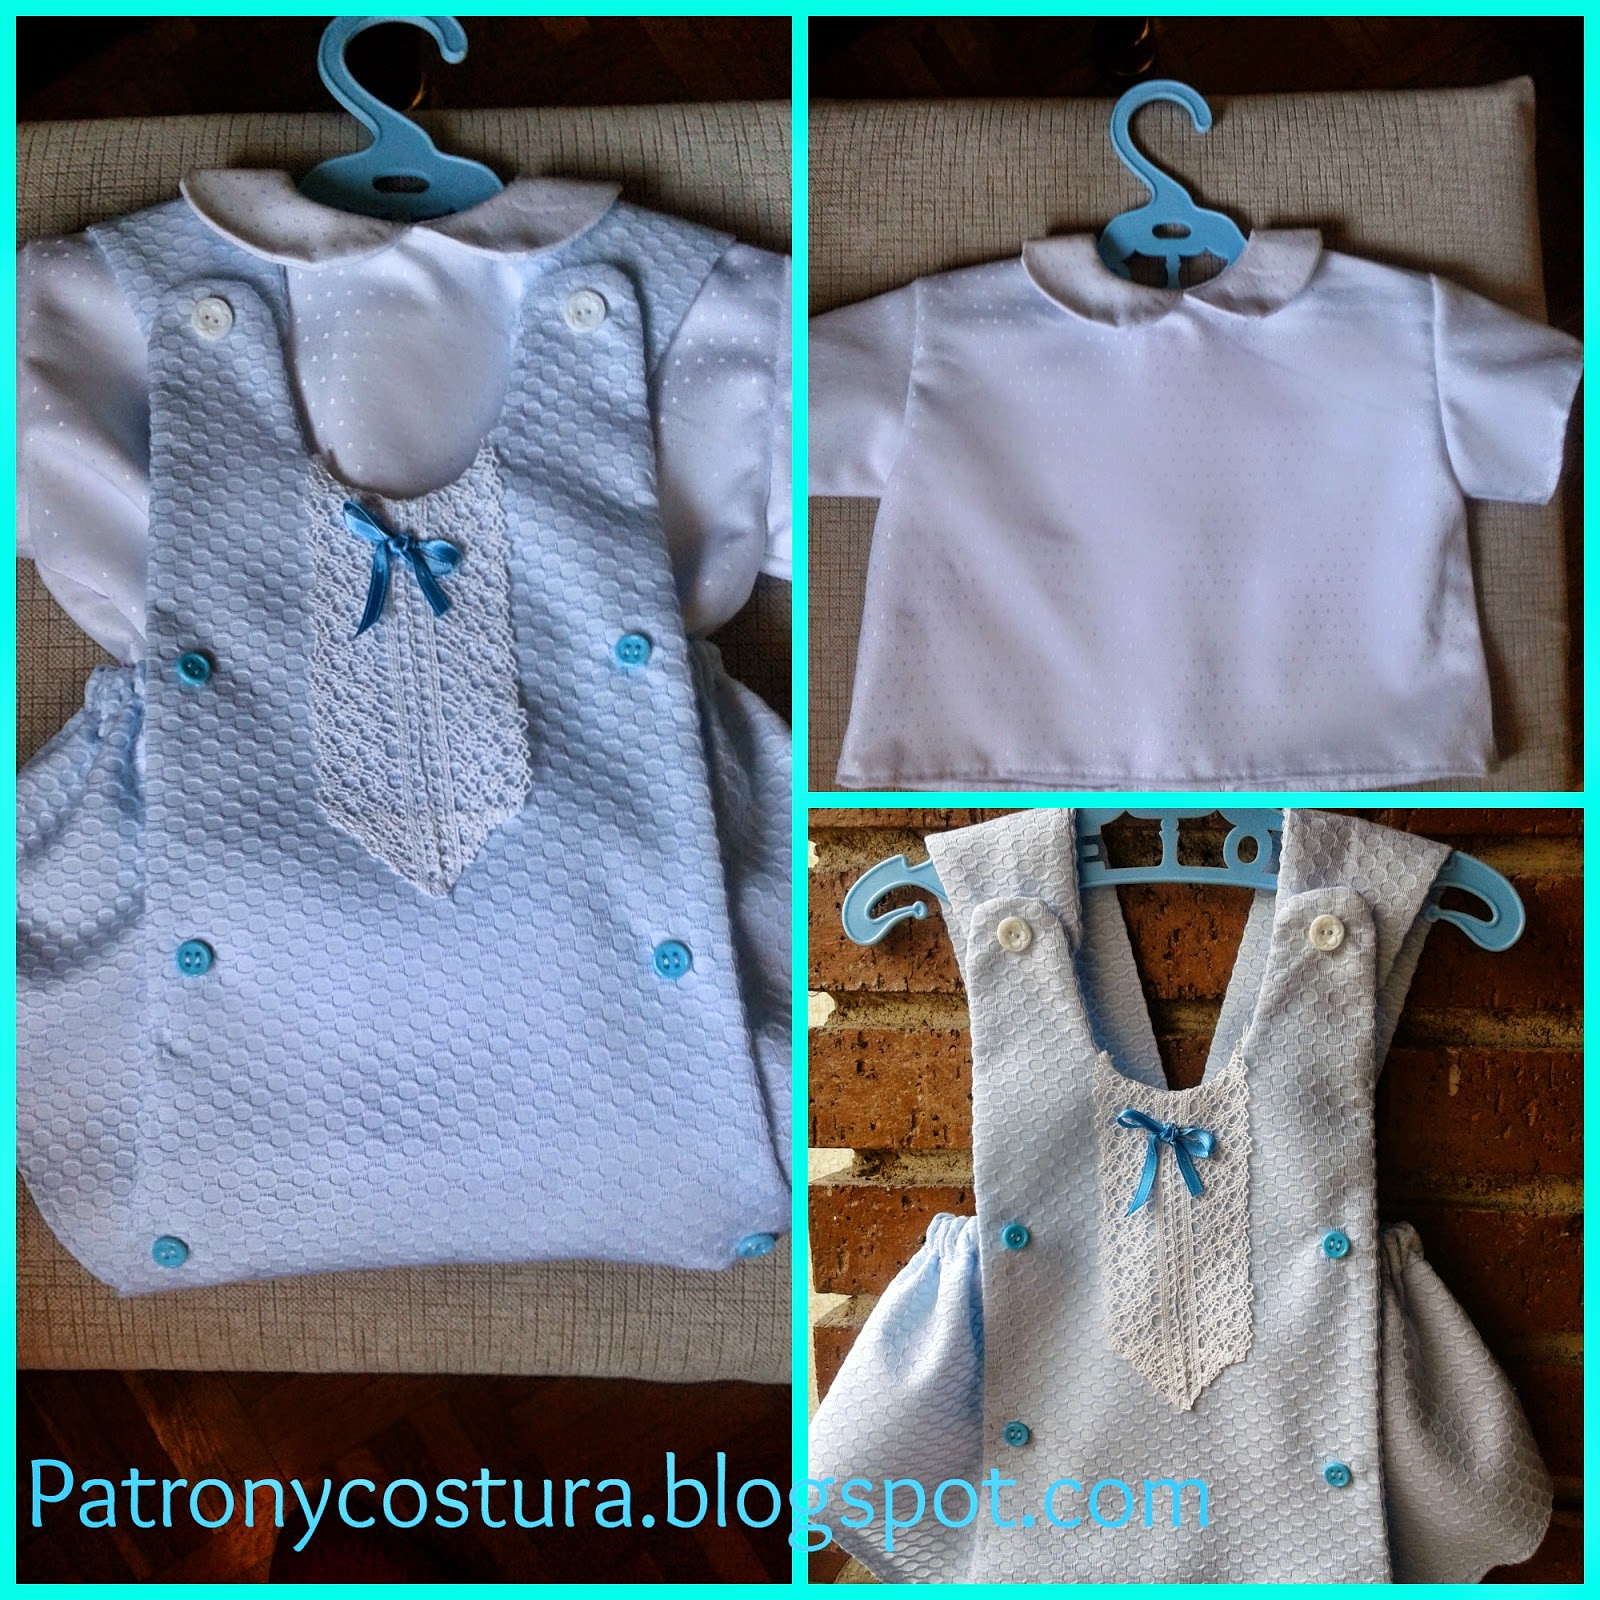 http://patronycostura.blogspot.com.es/2014/06/tema-47-camisa-bebe.html